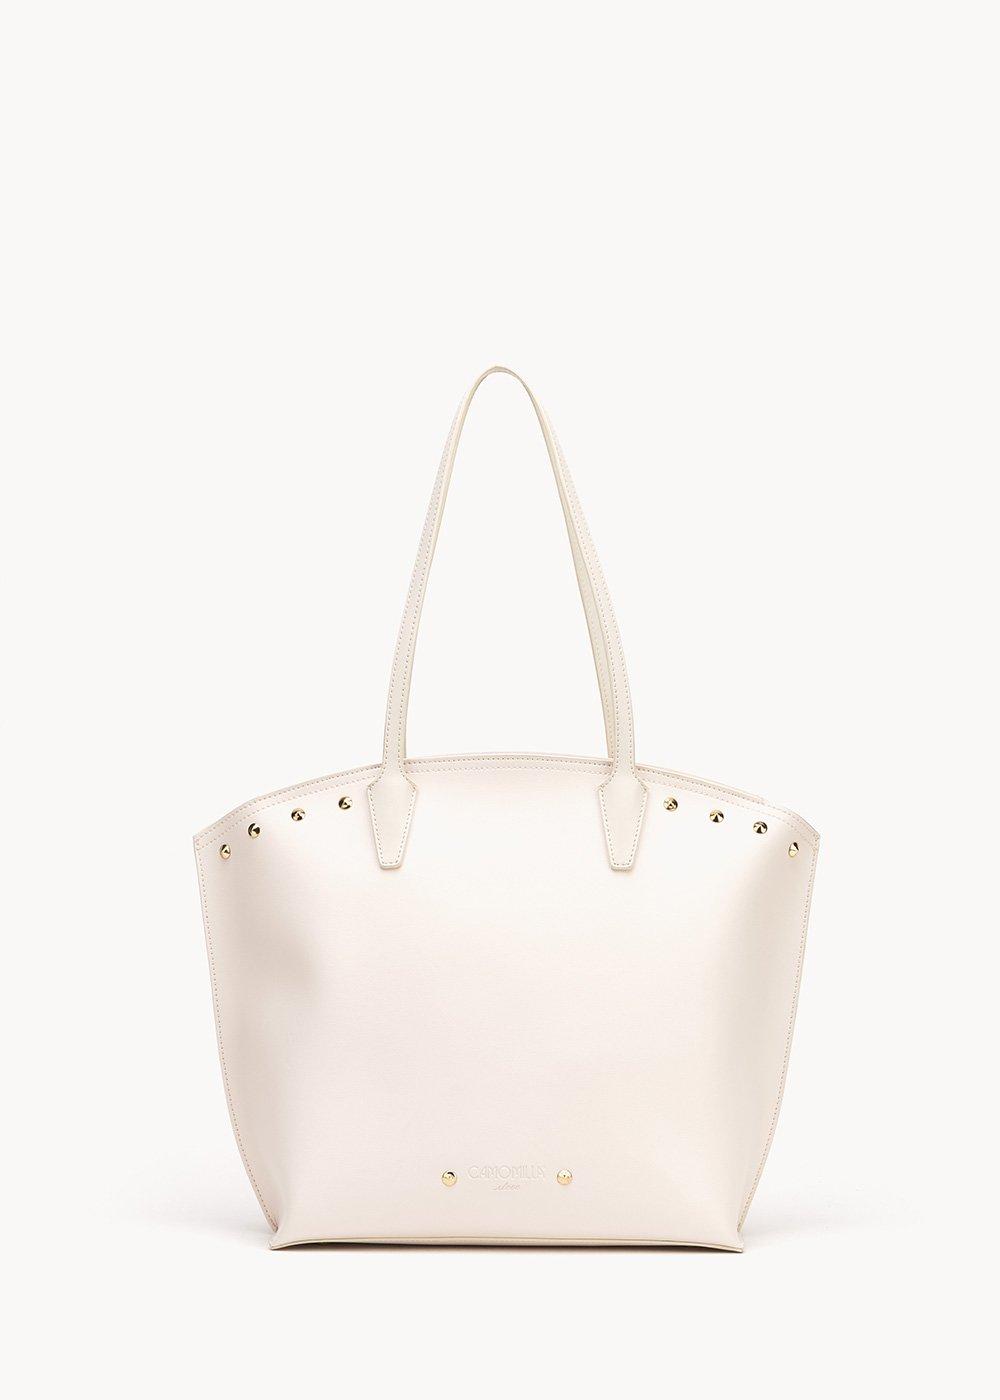 Brynn shopping bag - Light Beige - Woman